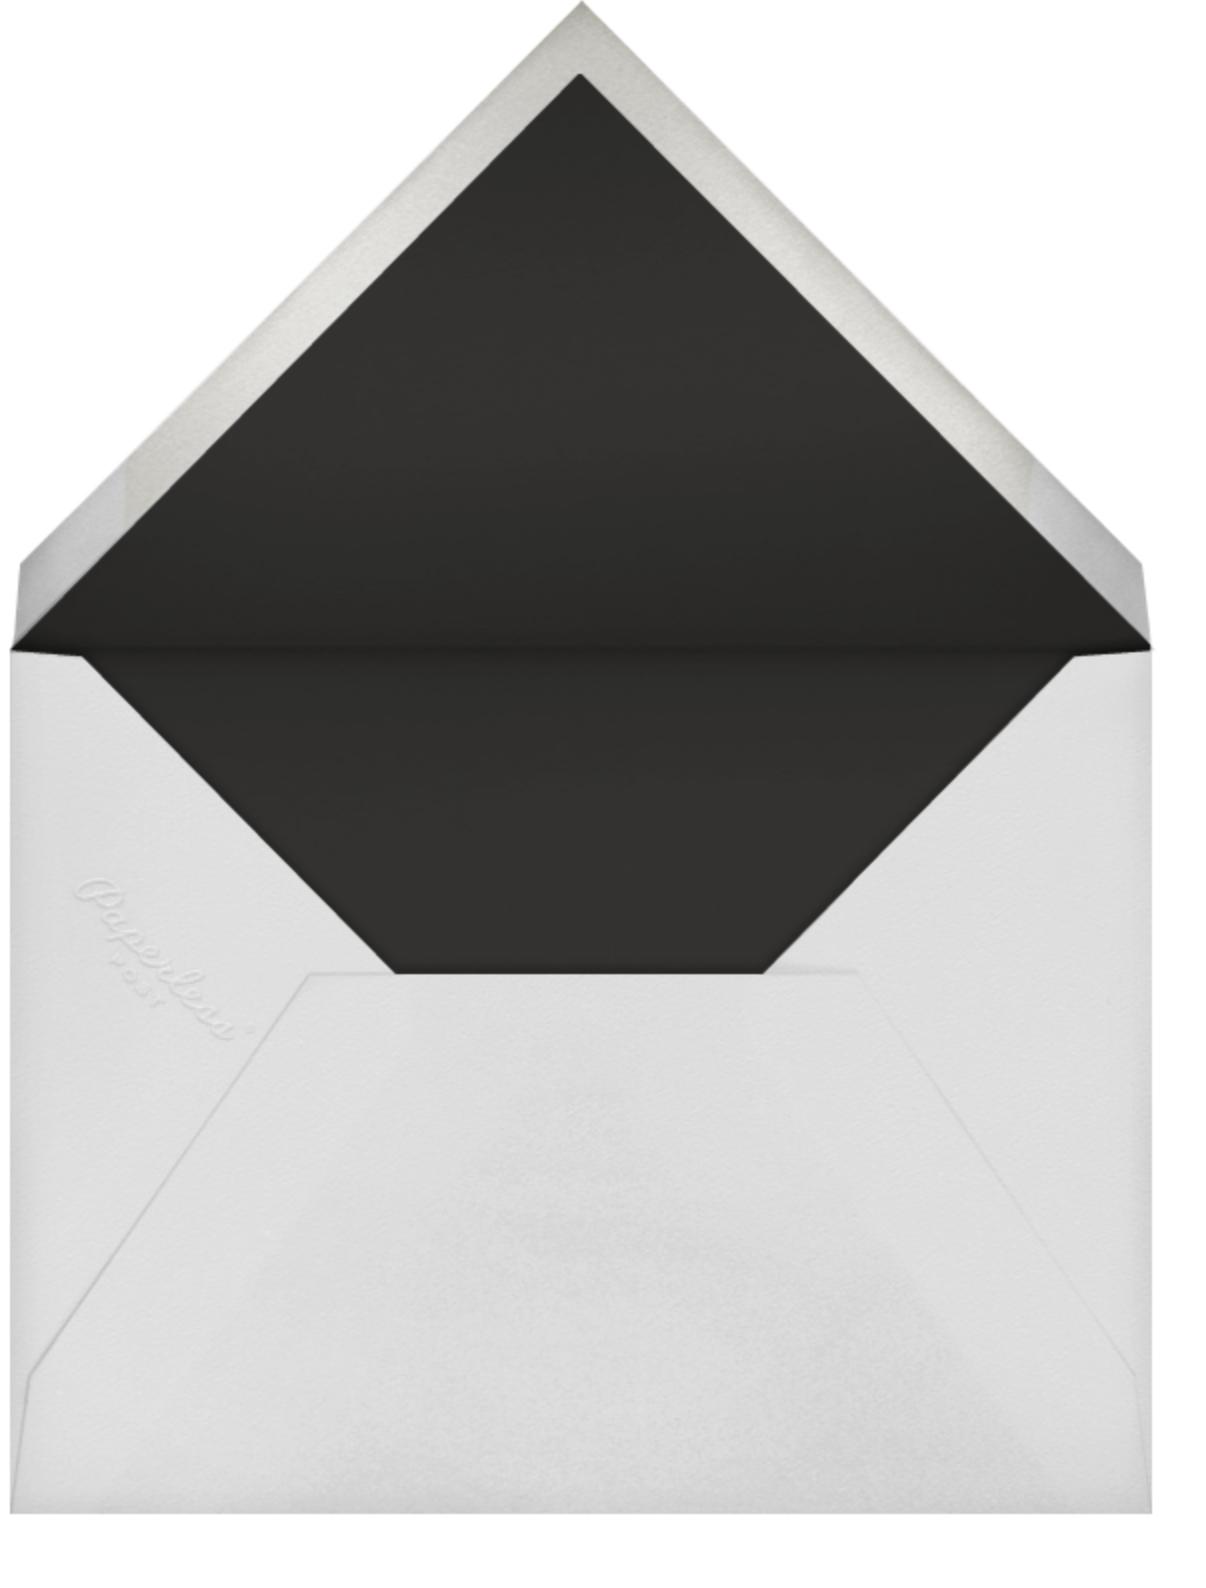 Richmond Park (Stationery) - Pink/Silver - Oscar de la Renta - Wedding - envelope back